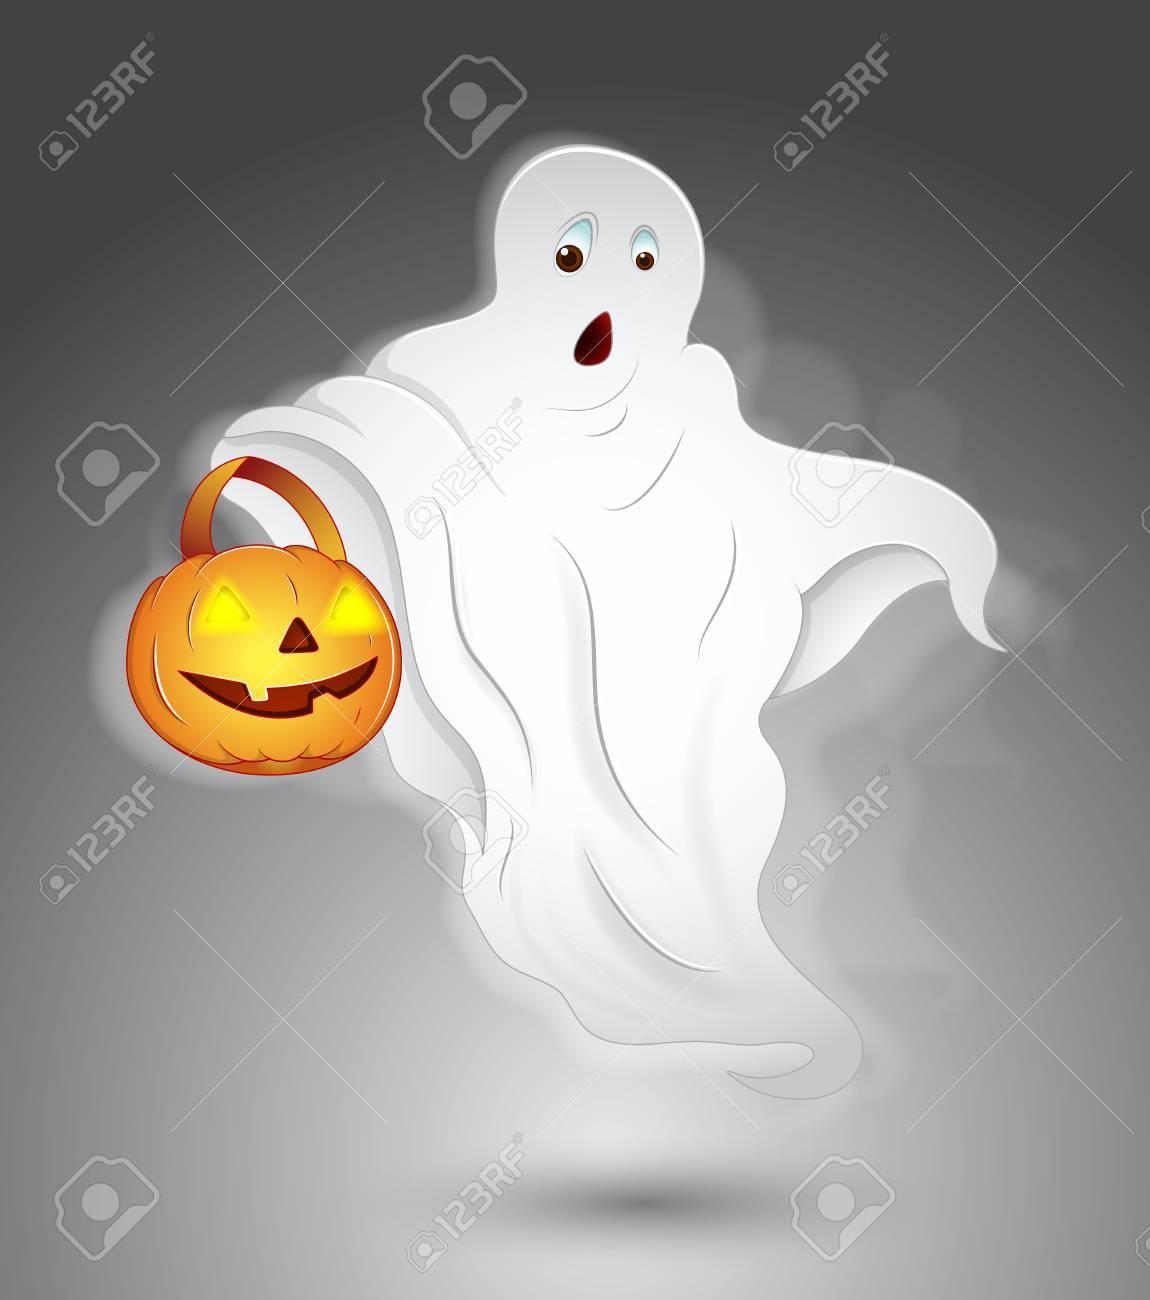 Ghost Stock Vector - 13249655